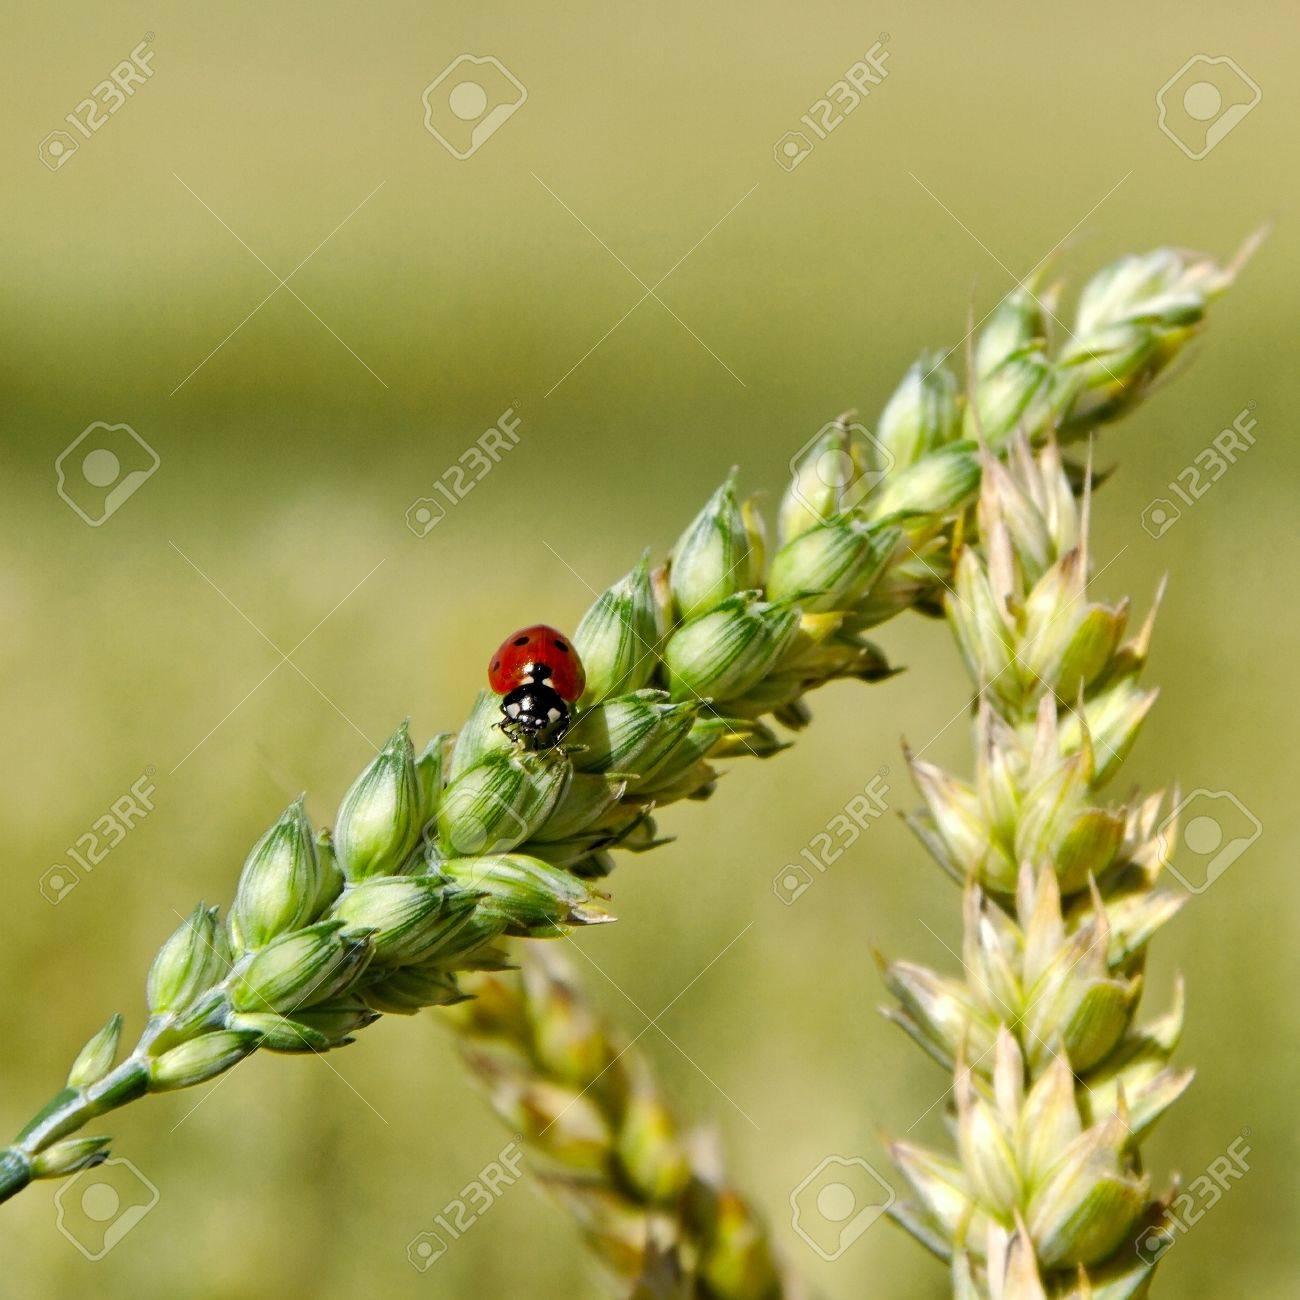 Ladybird on the spike of wheat Stock Photo - 18344330